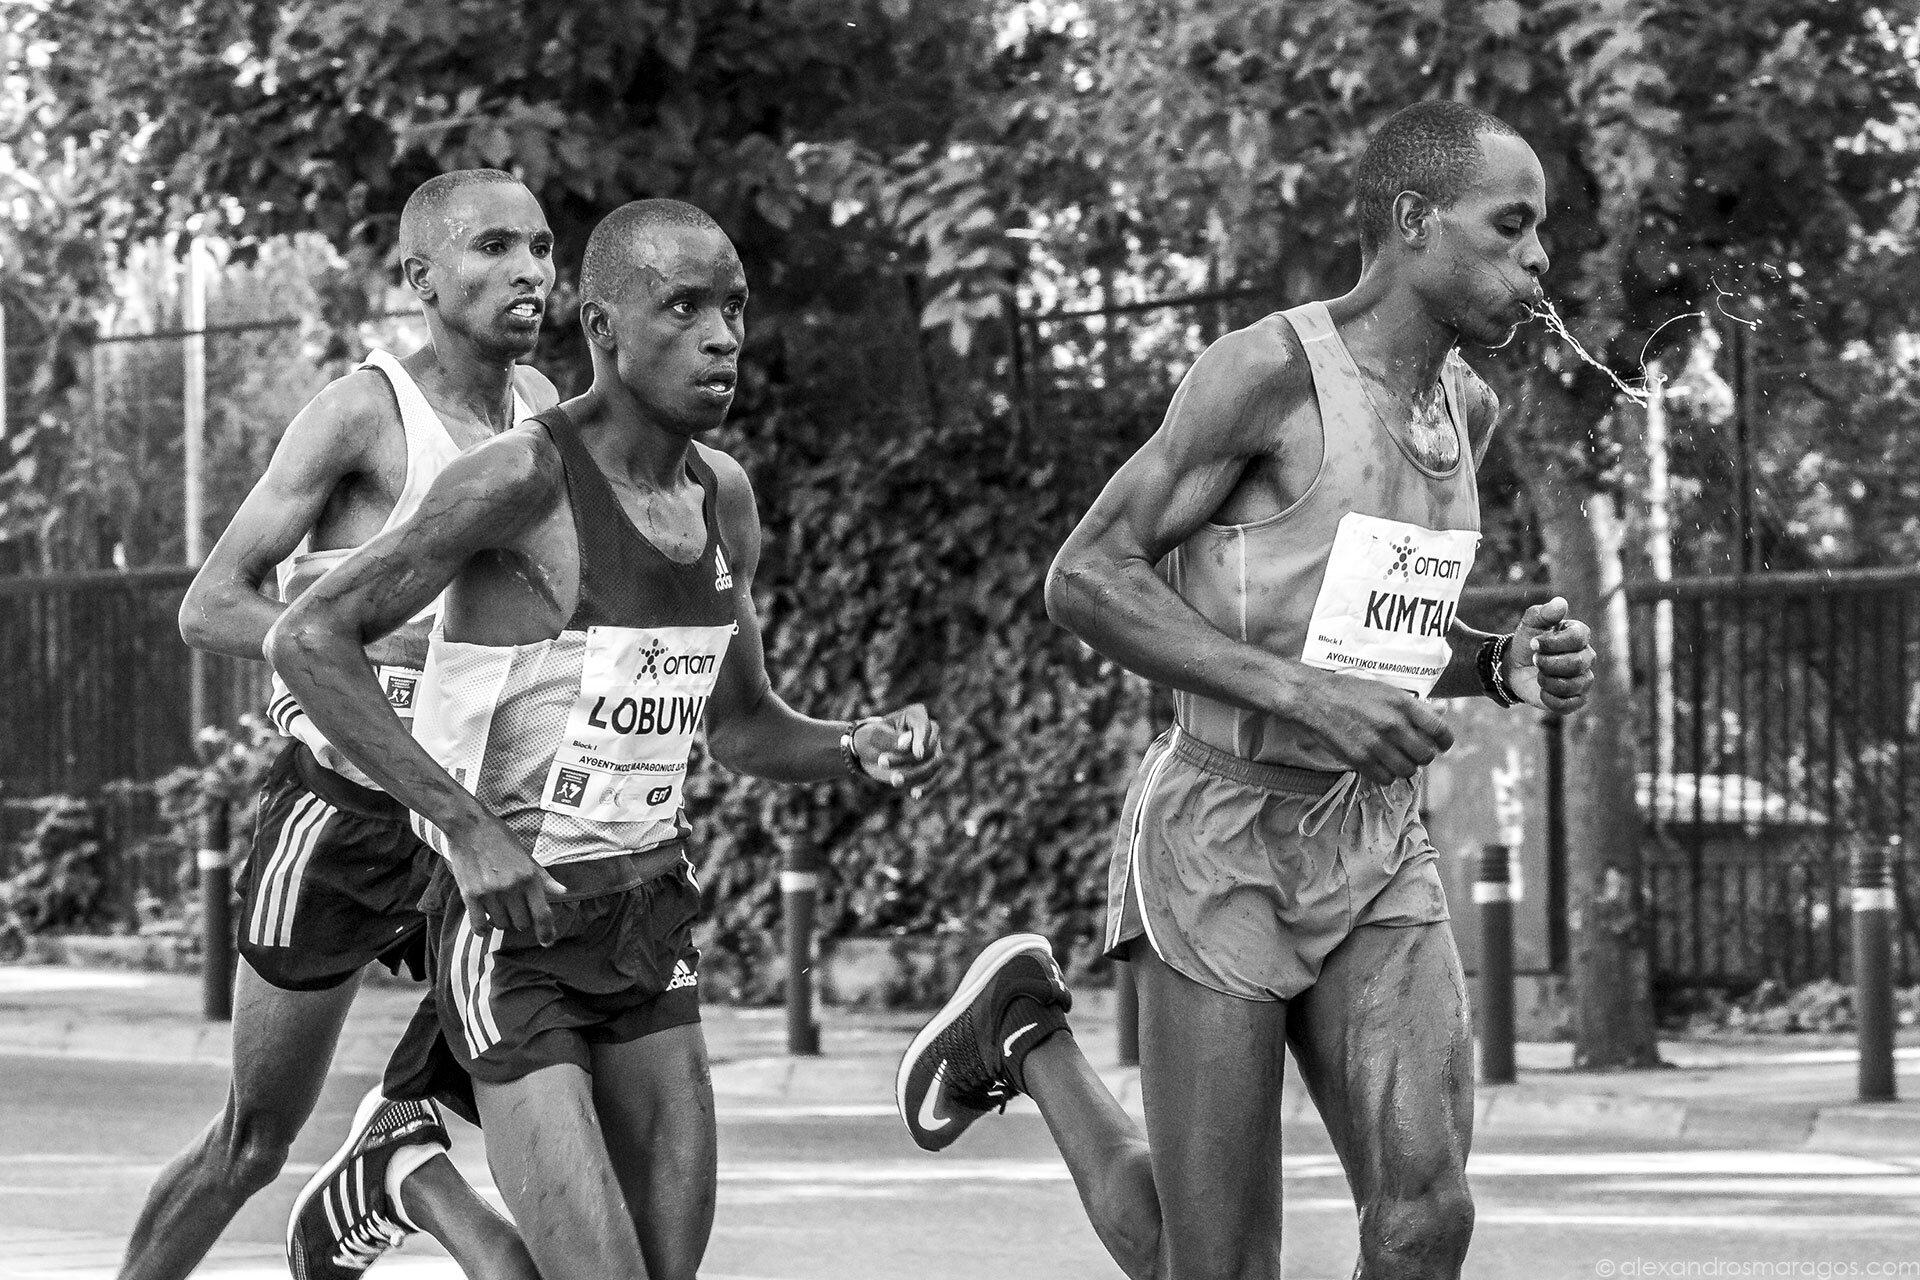 Athens Marathon, The Authentic